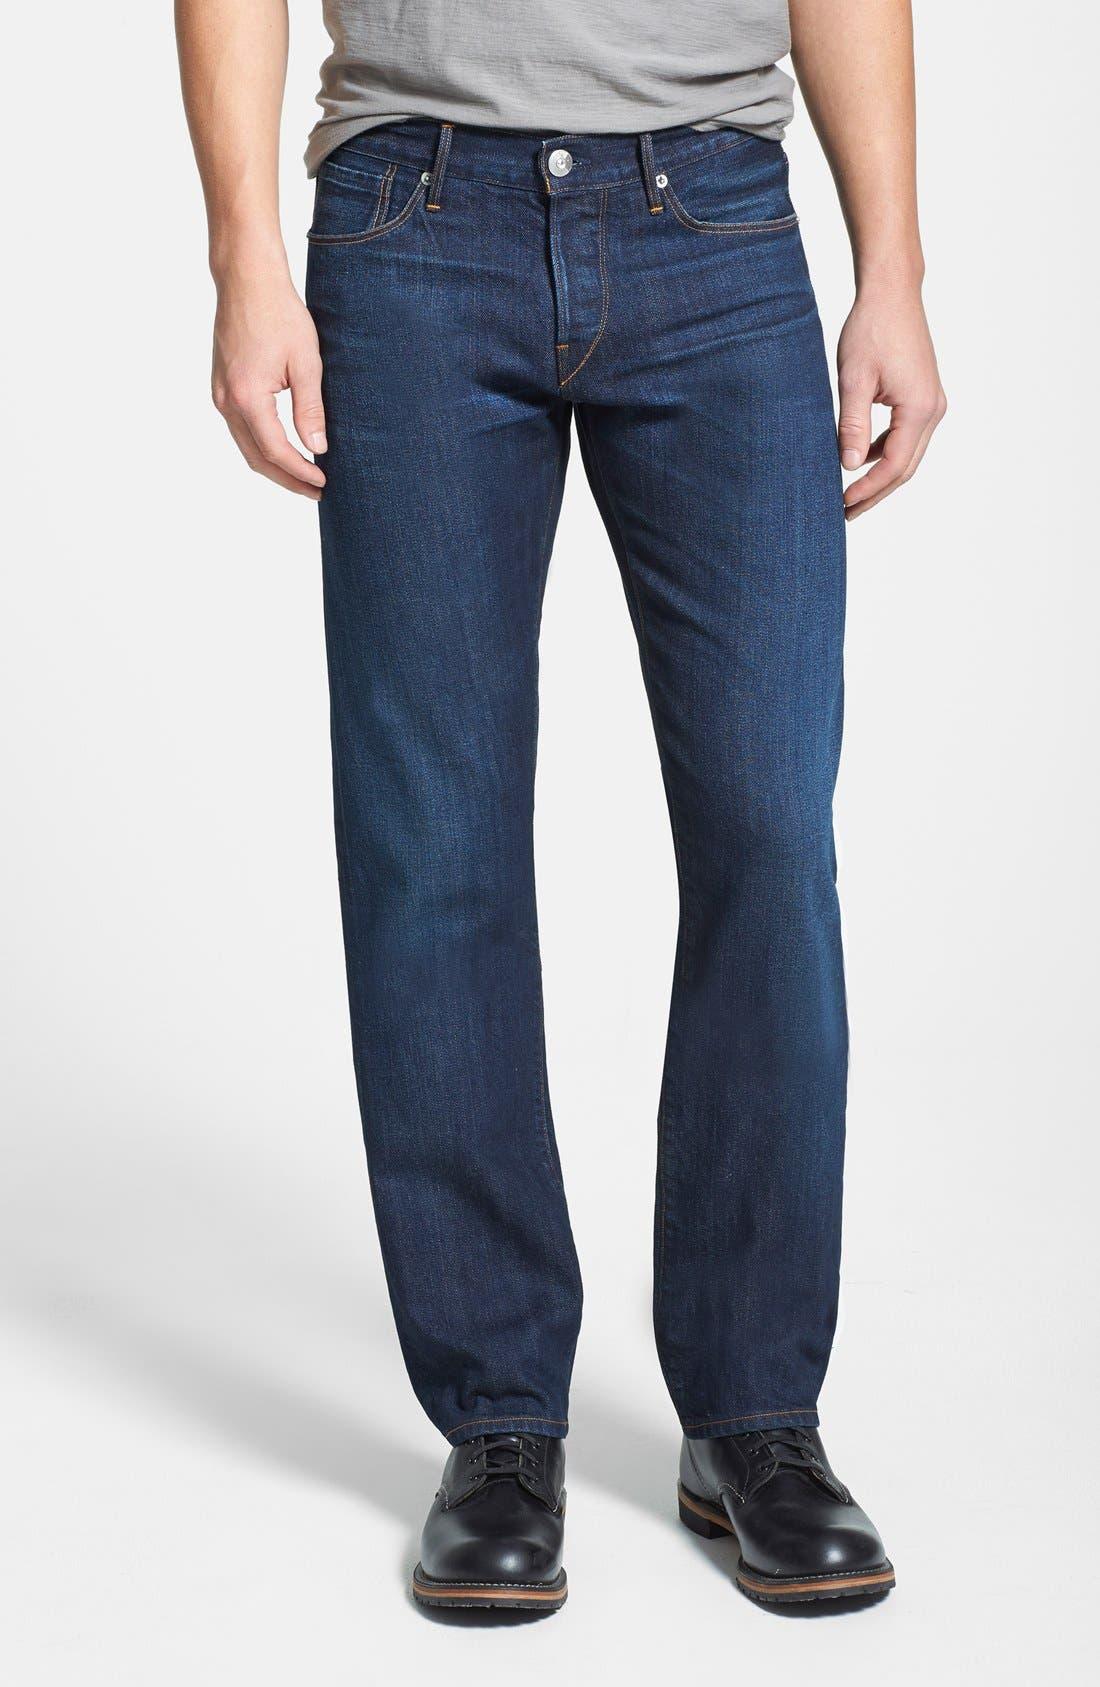 'M4' Straight Leg Selvedge Jeans,                             Main thumbnail 1, color,                             413